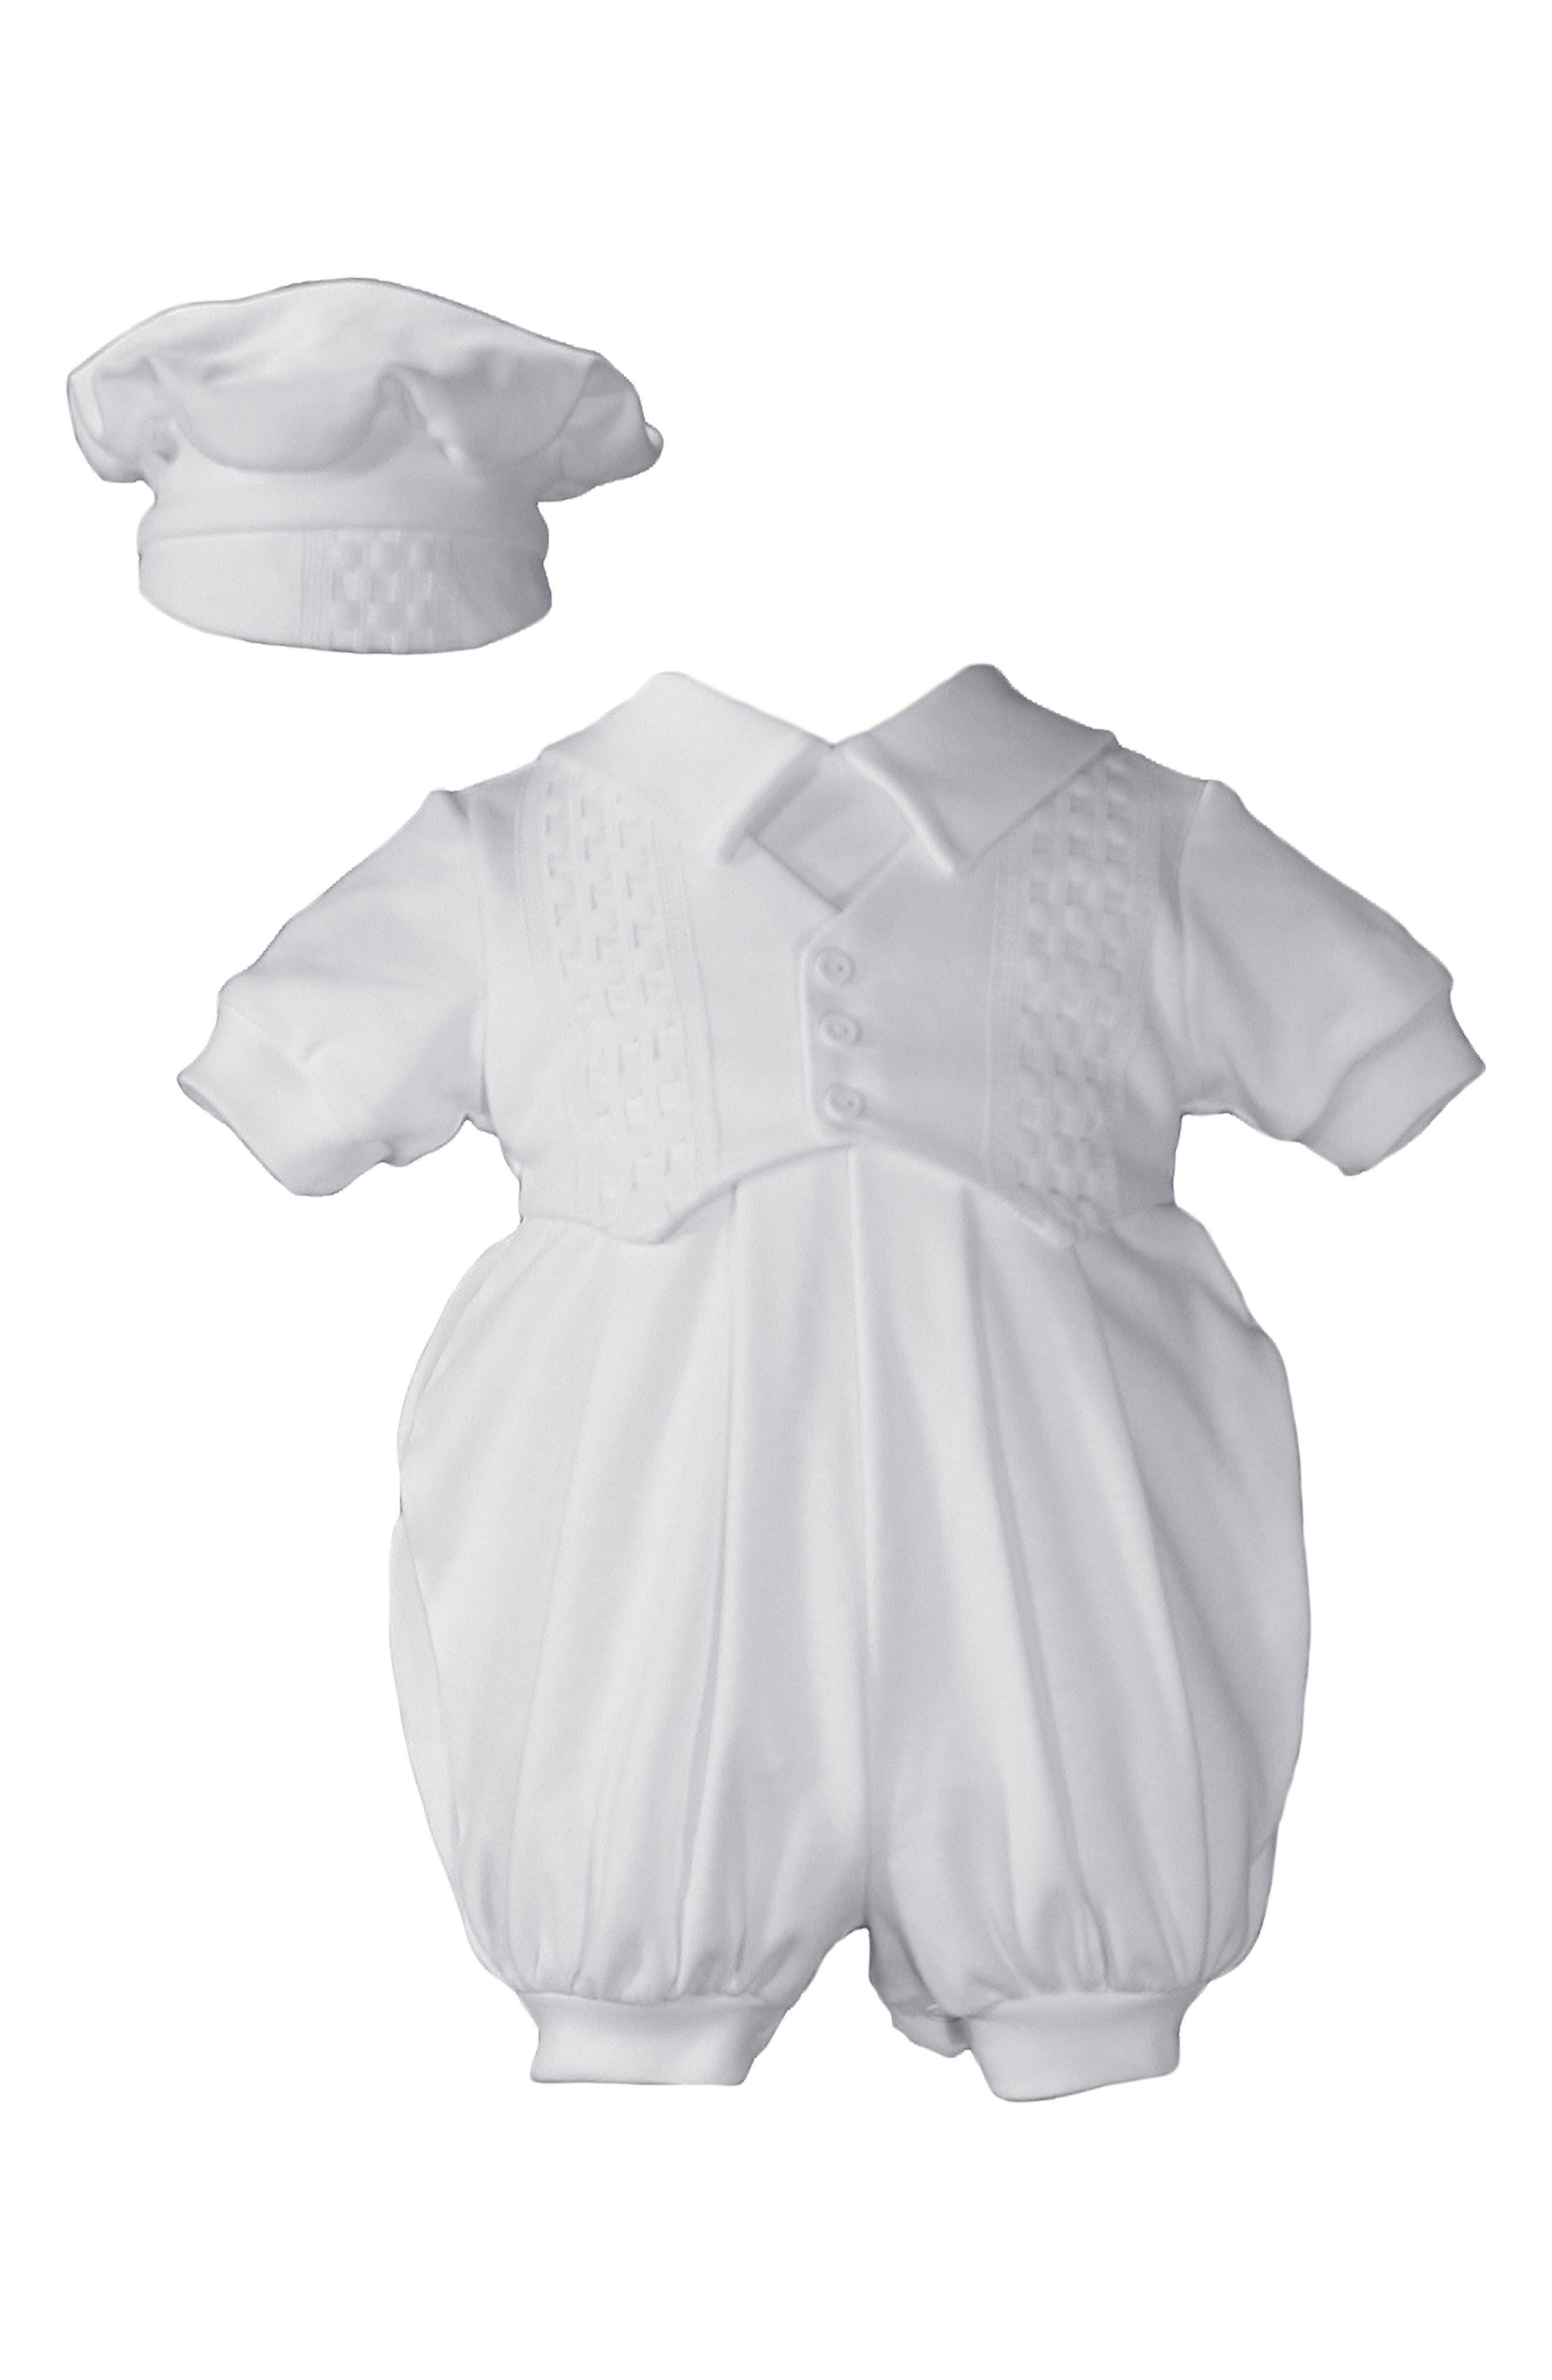 Romper & Hat Set,                             Main thumbnail 1, color,                             WHITE